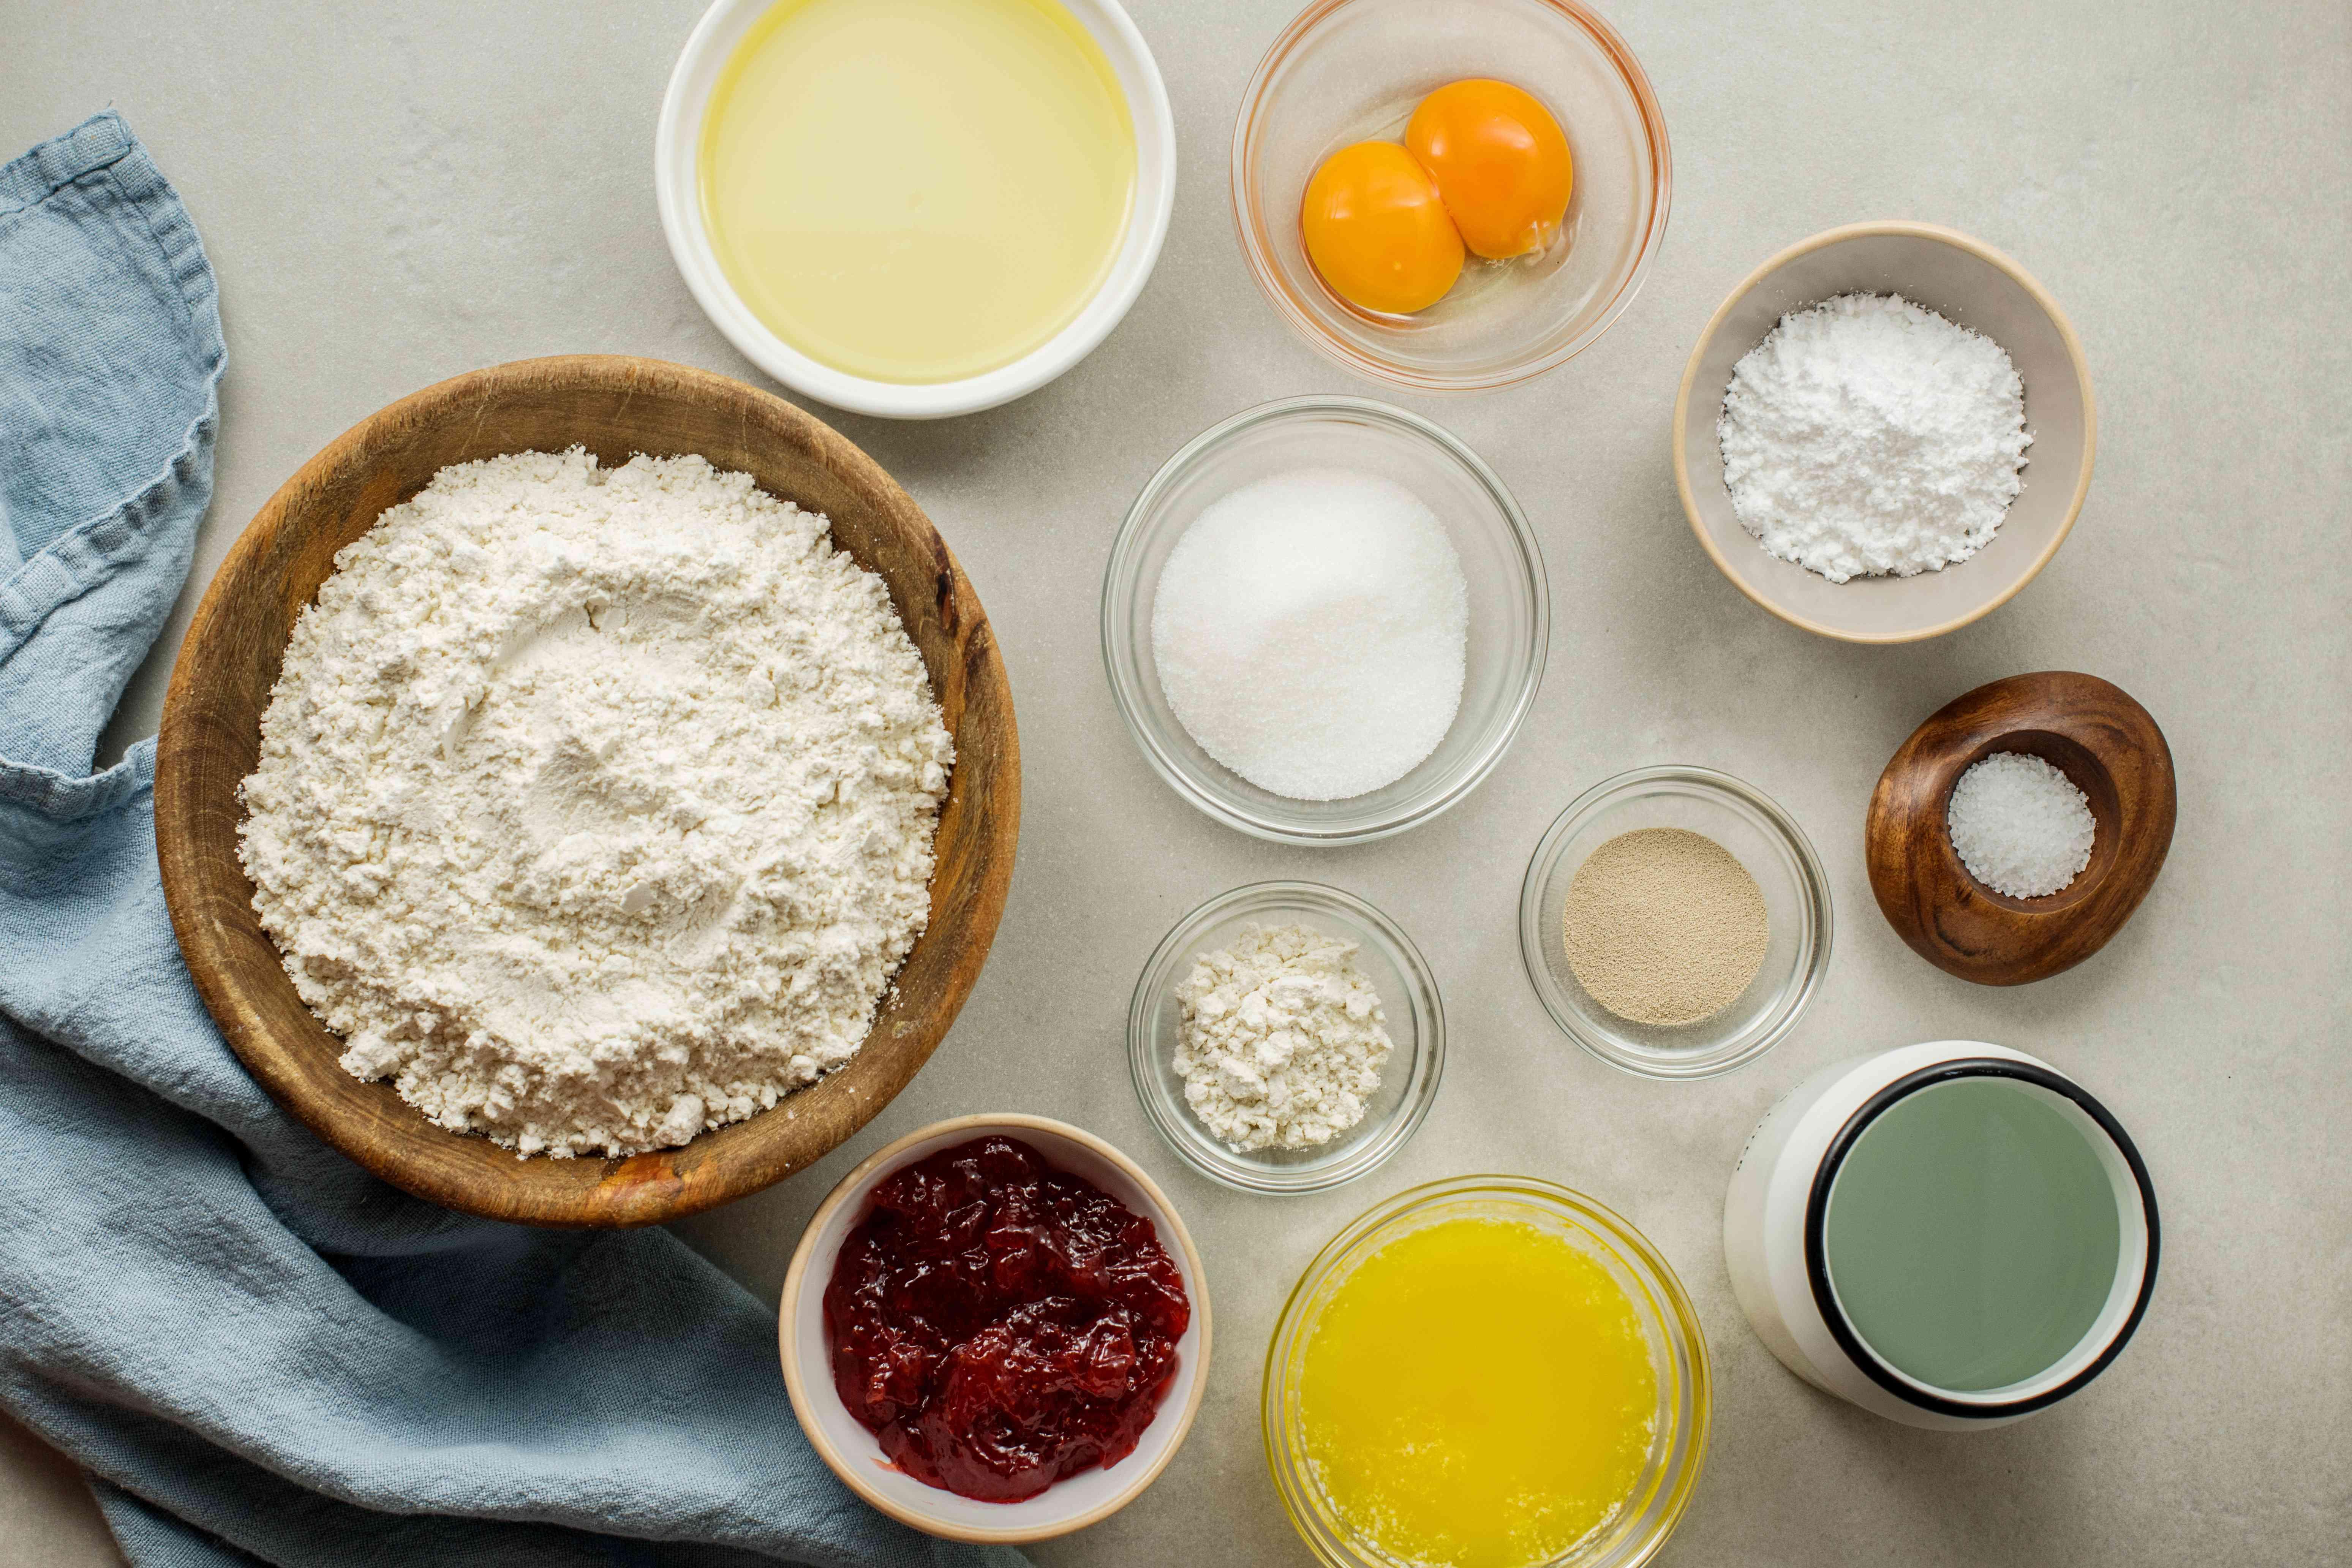 Gather ingredients for Hanukkah doughnuts